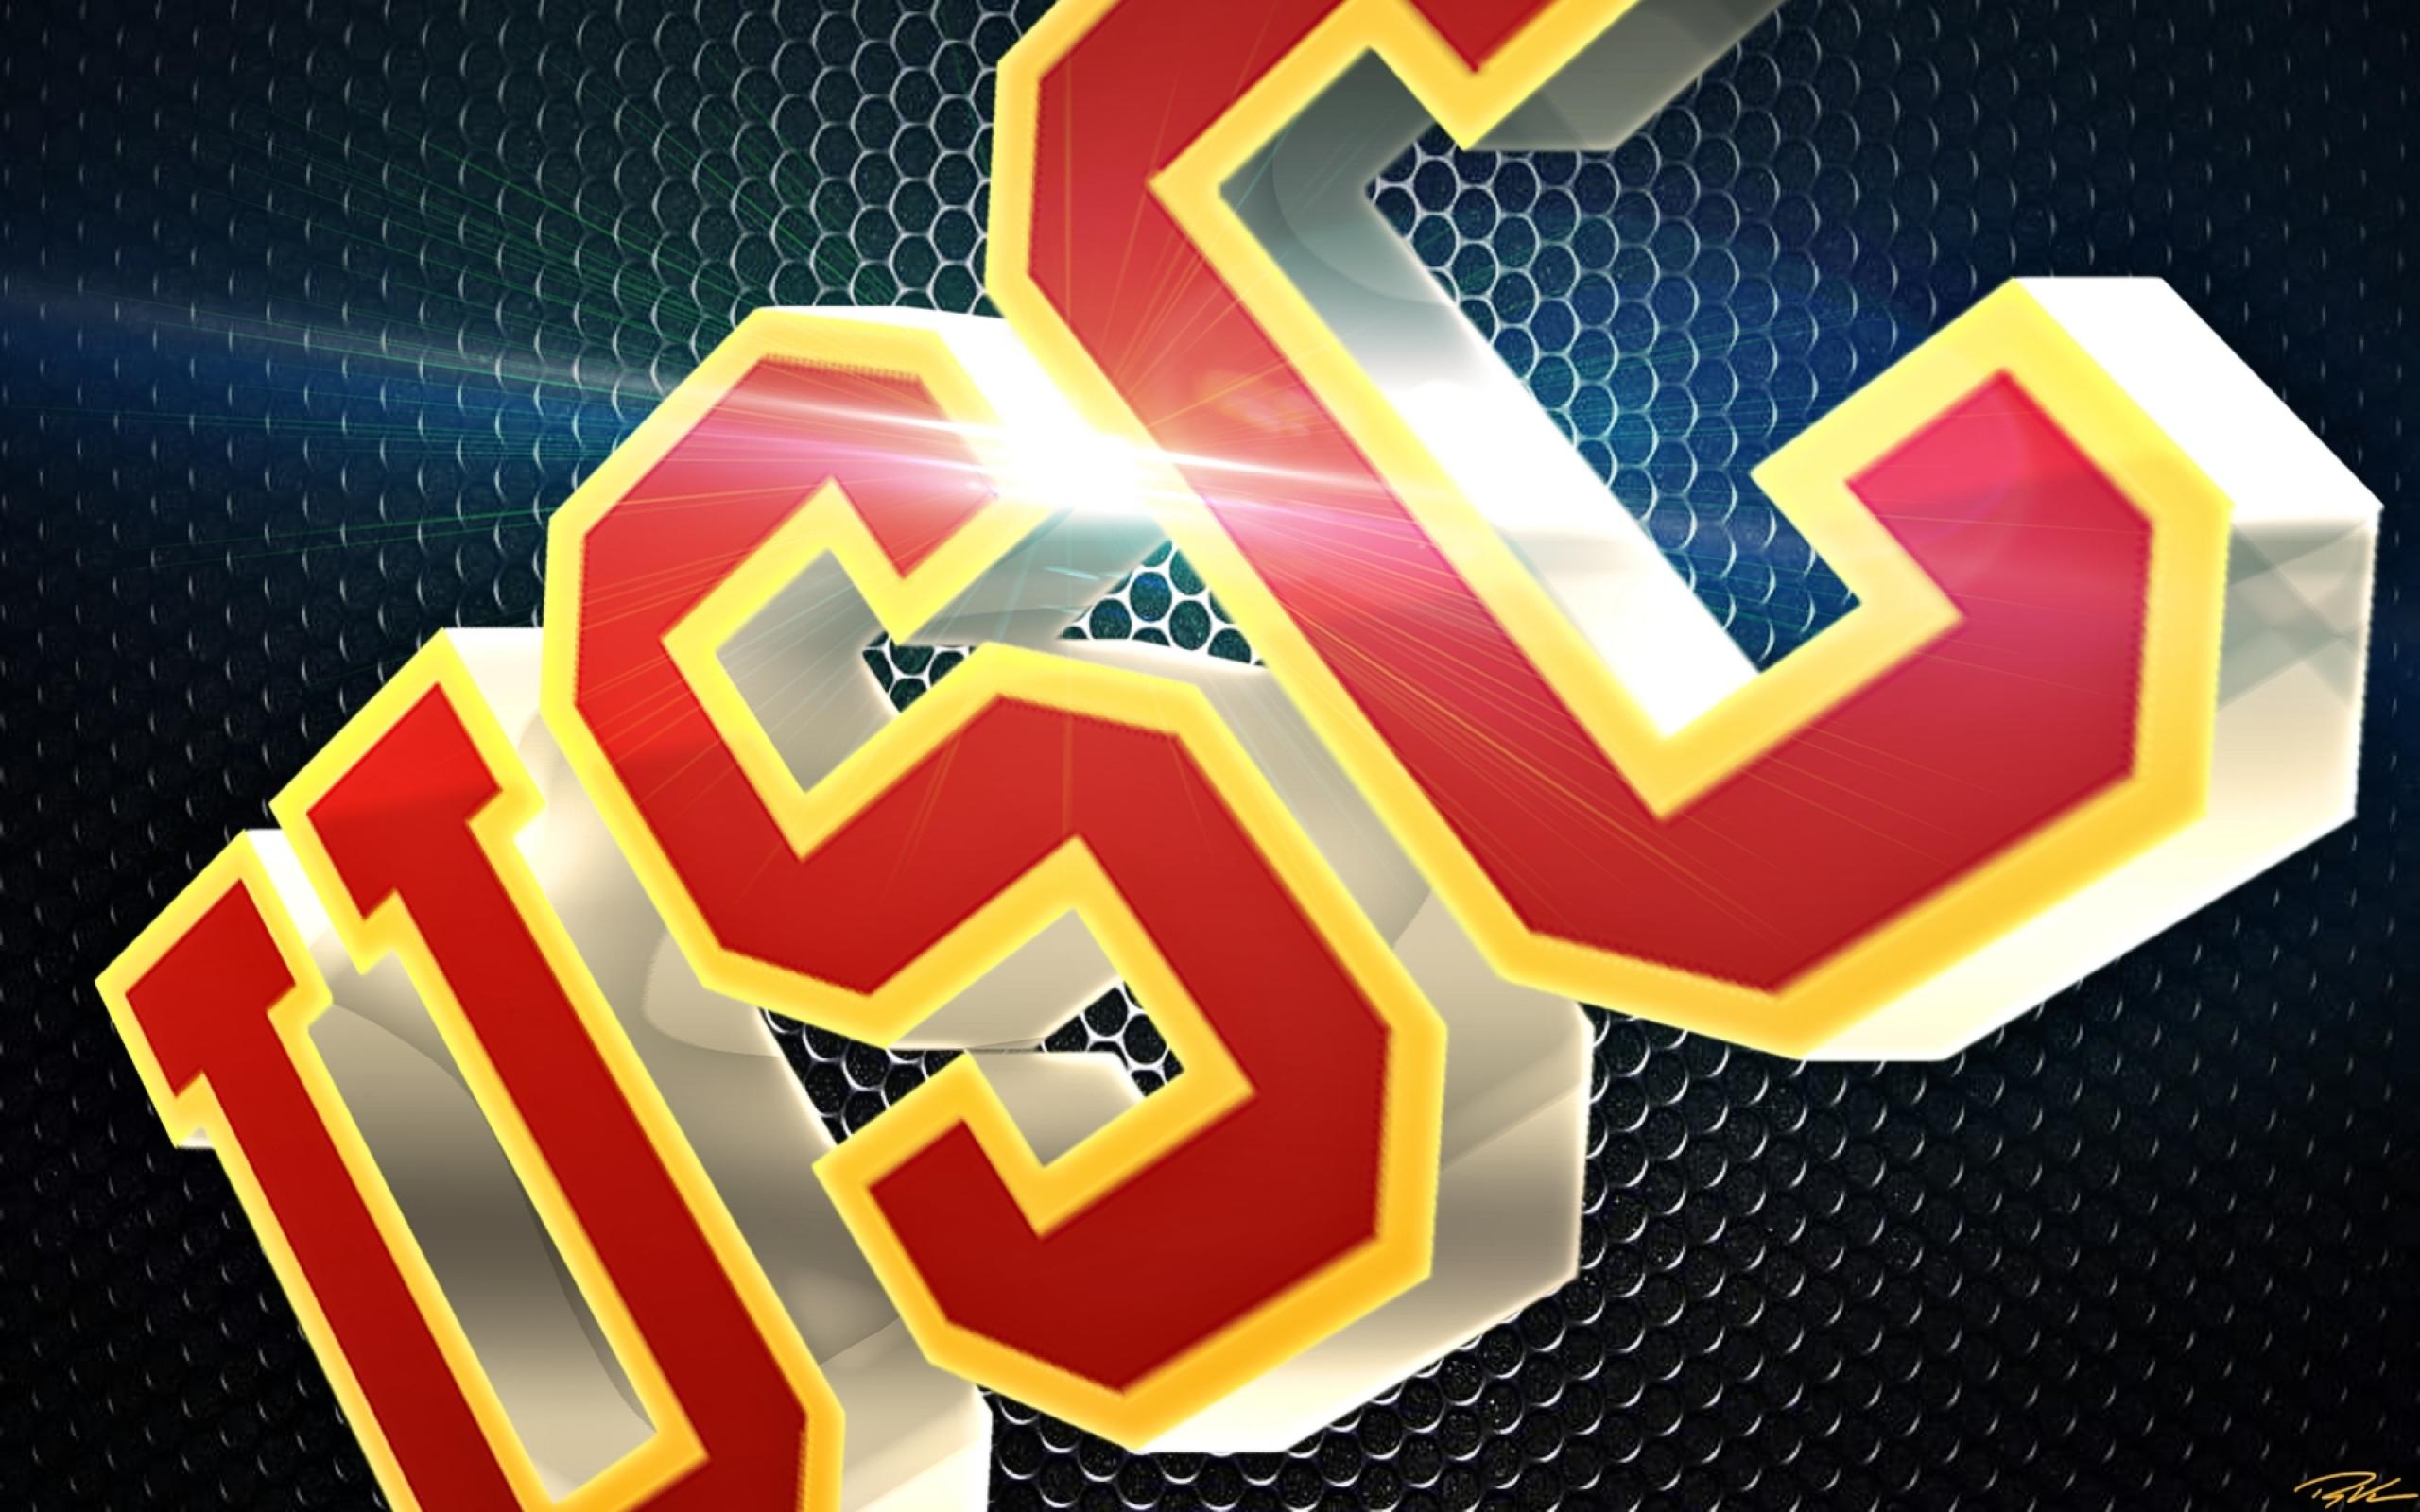 Wallpapers Download 2560x1600 FOOTBALL NCAA USC TROJANS Wallpaper 2560x1600